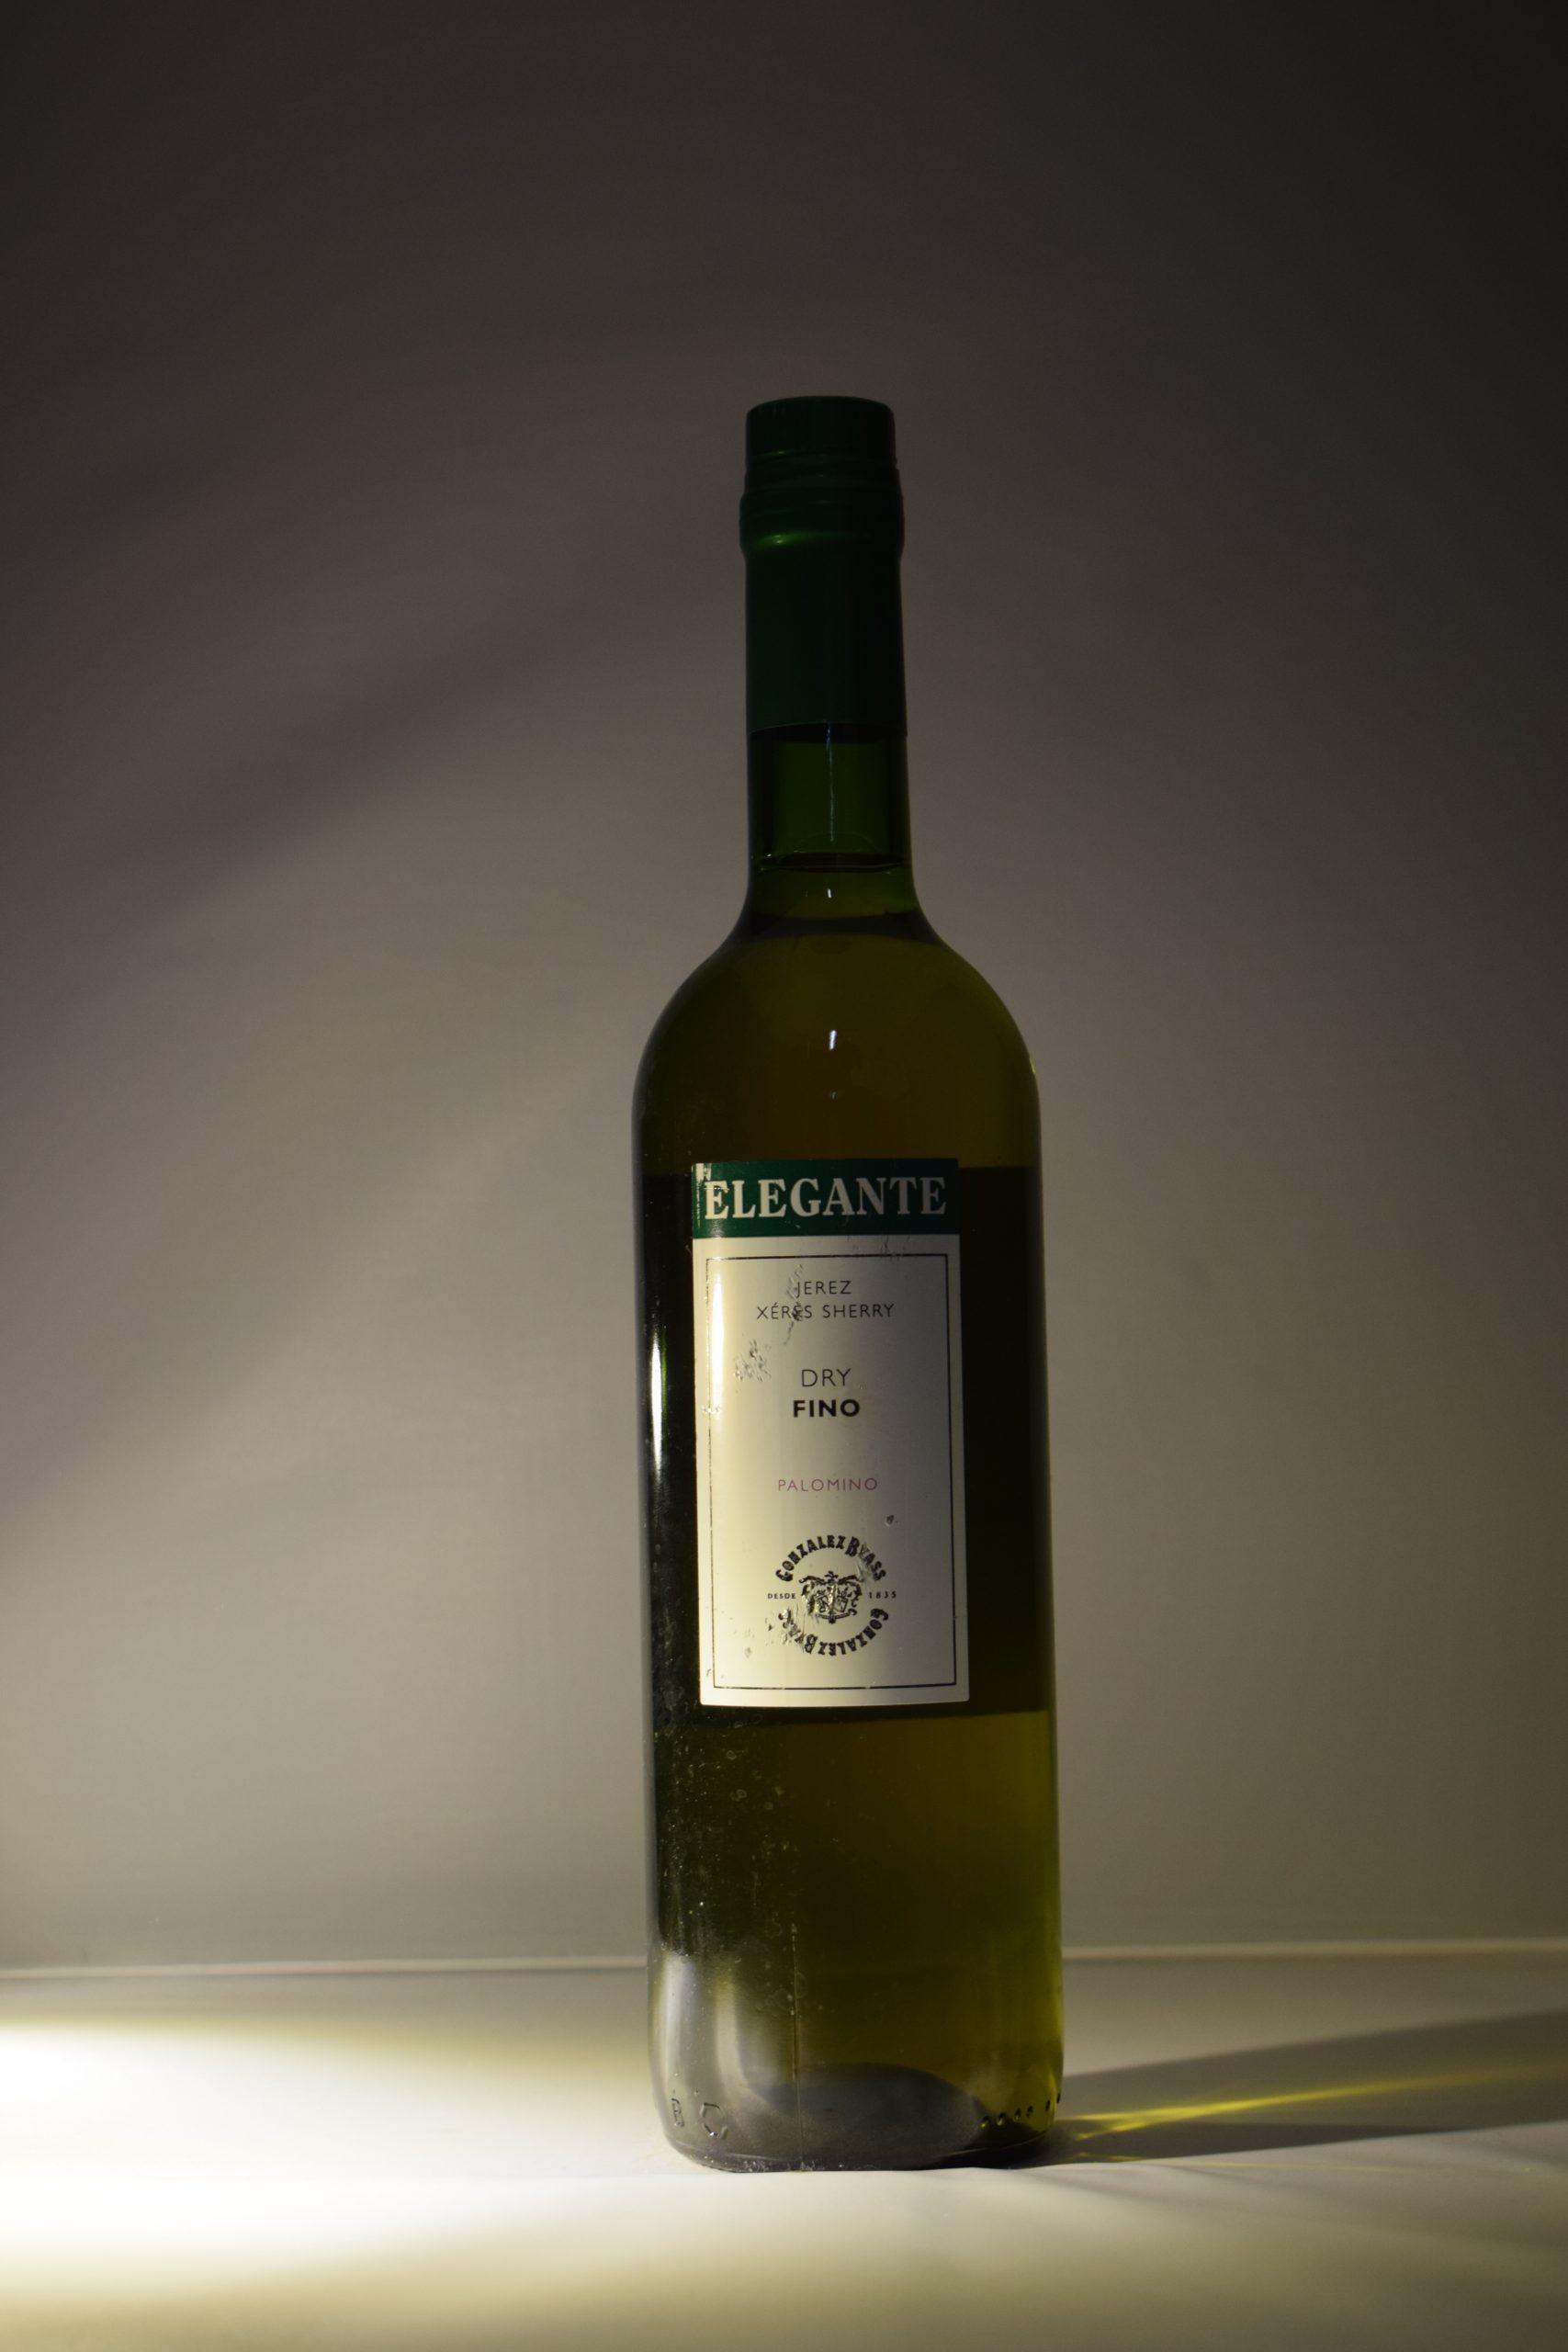 Elegante Dry Fino Sherry